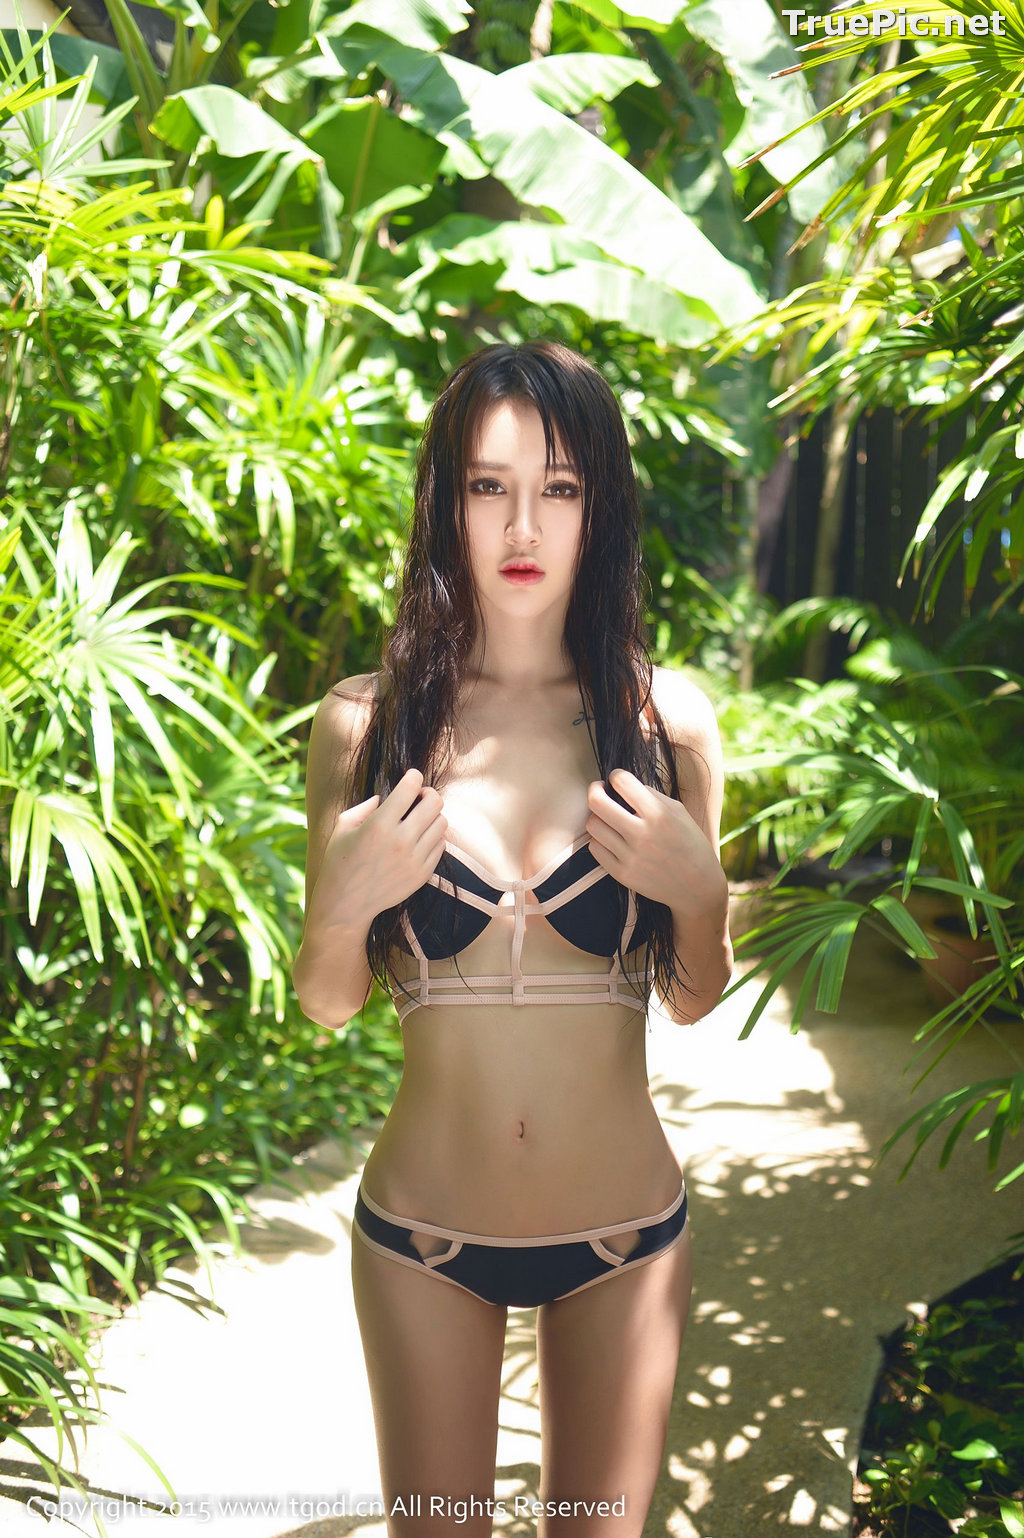 Image TGOD 2015-11-10 - Chinese Sexy Model - Cheryl (青树) - TruePic.net - Picture-24